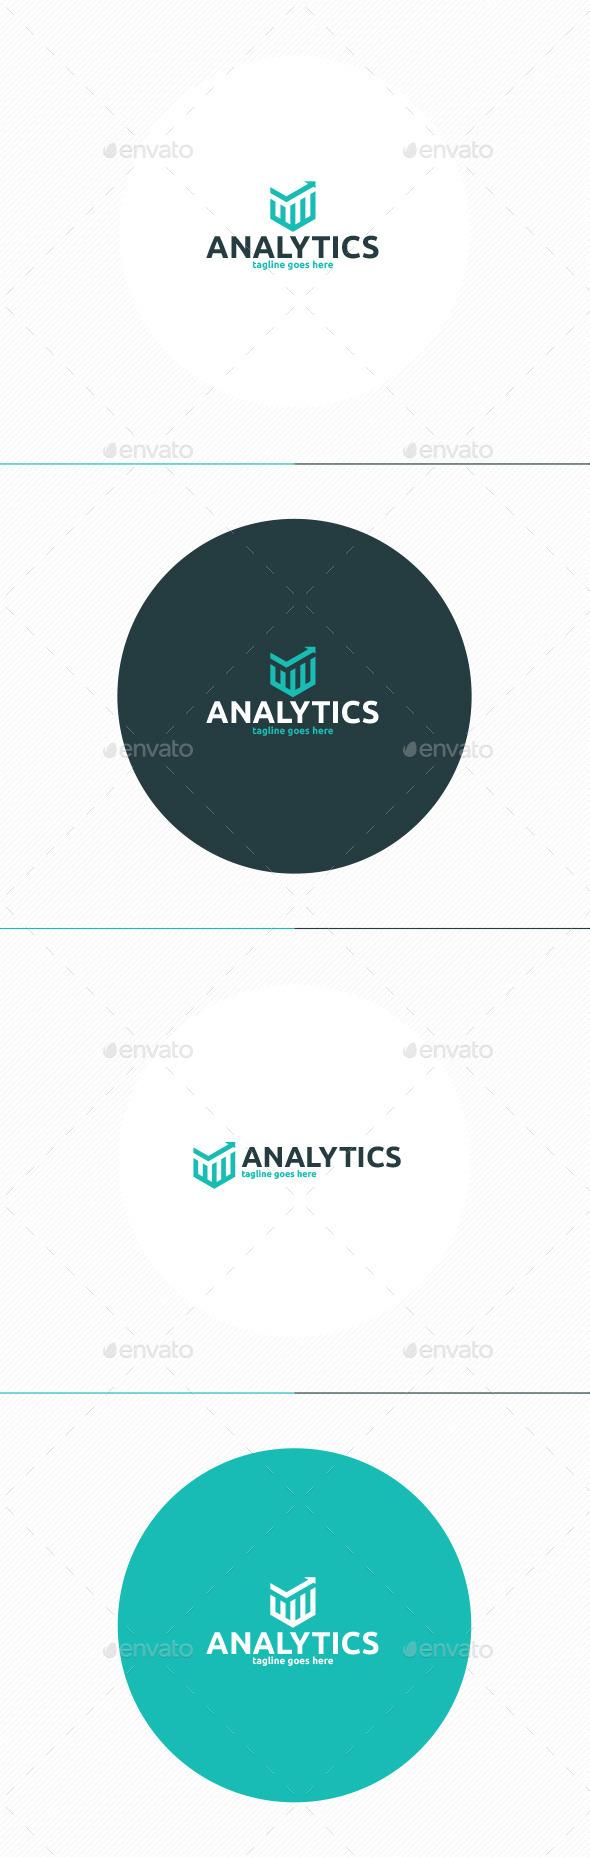 Analytics Logo - Vector Abstract